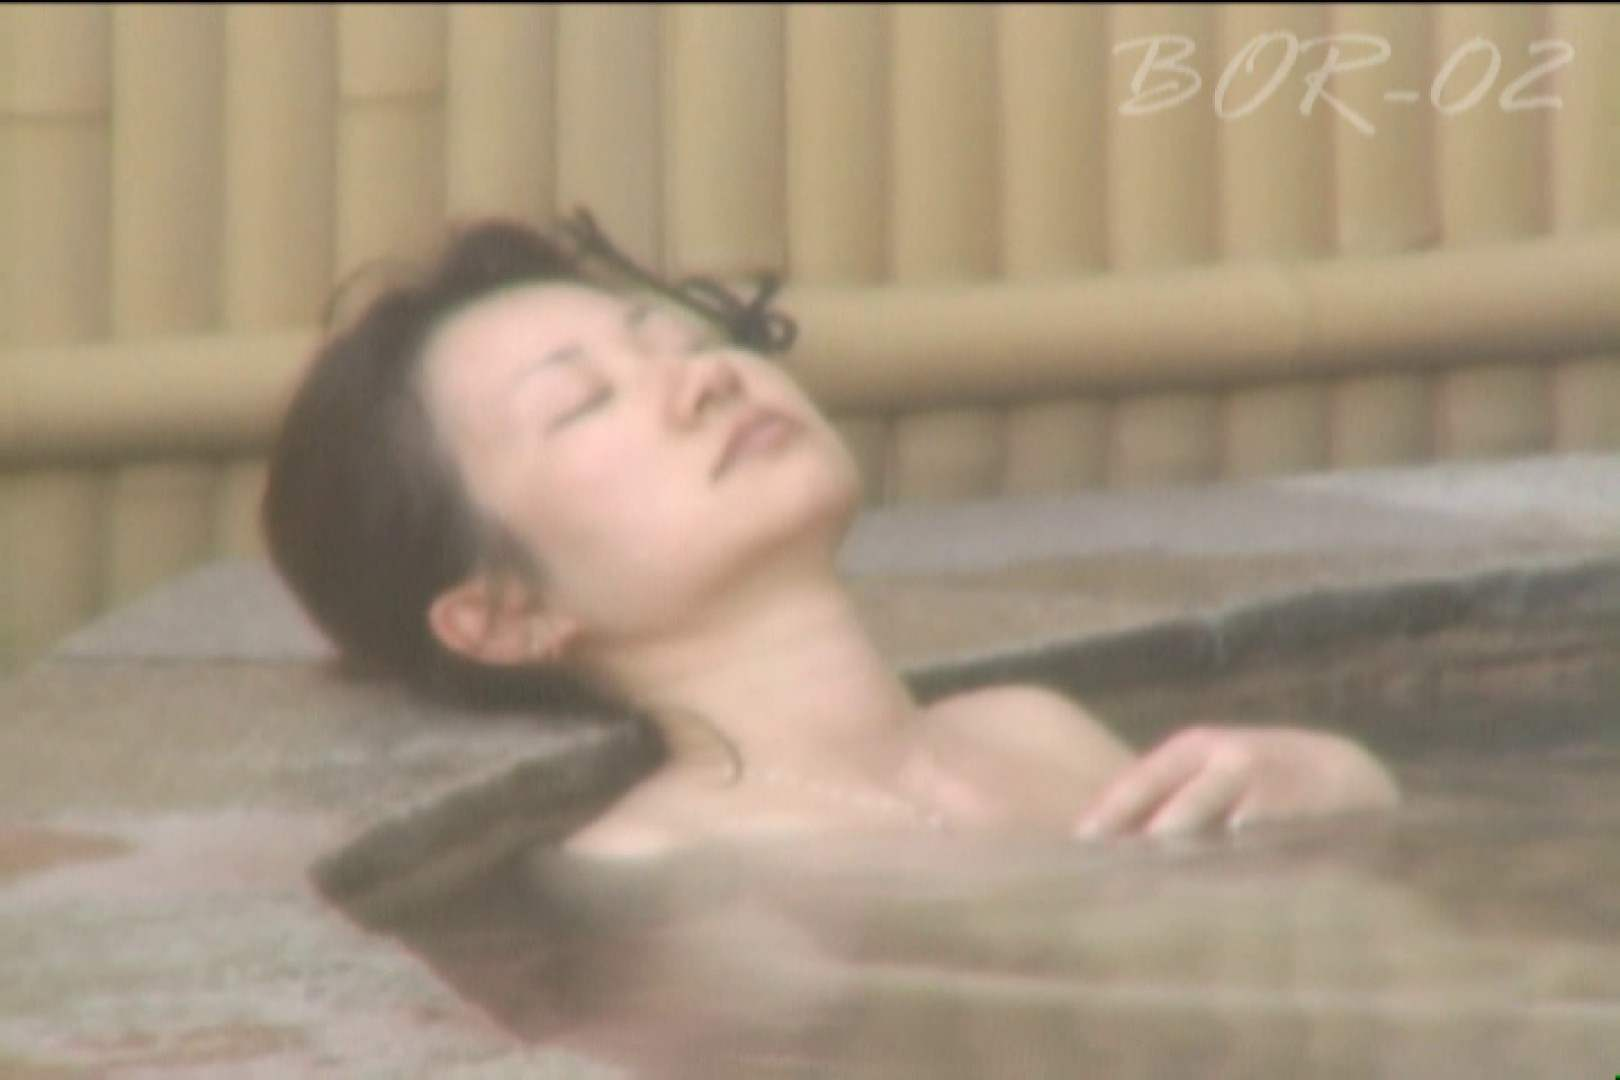 Aquaな露天風呂Vol.477 OLセックス 盗撮われめAV動画紹介 86画像 50